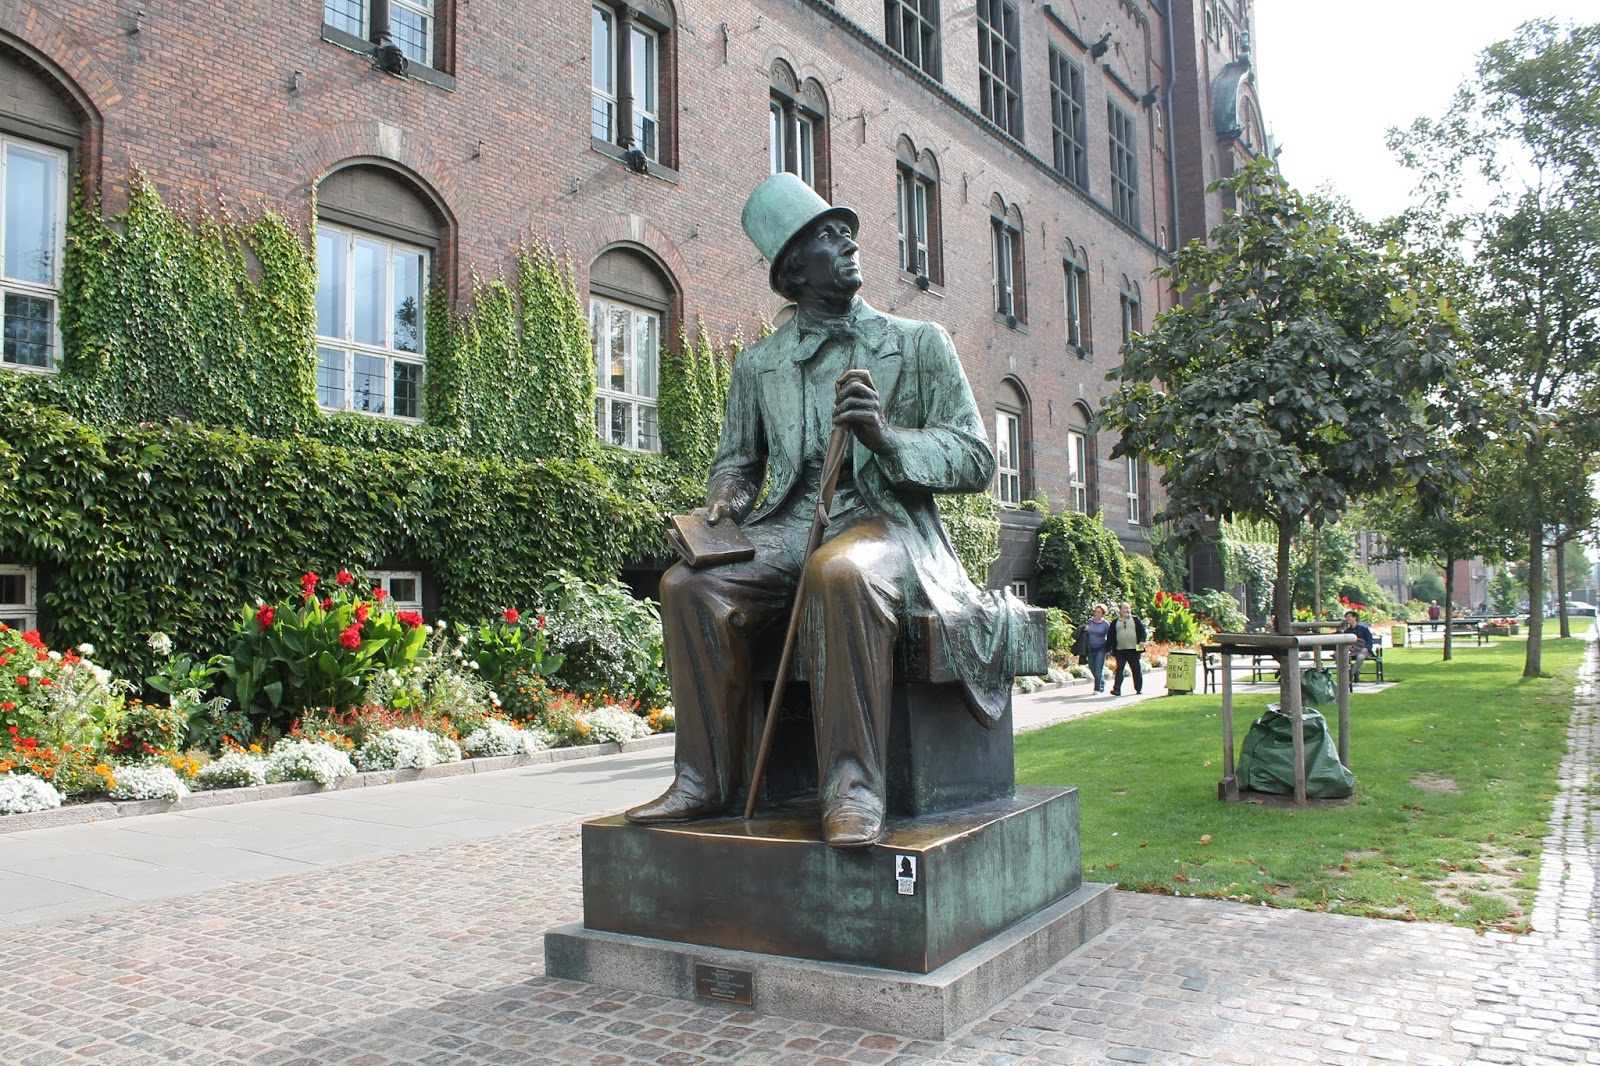 Hans Christian Anderson Statue - Copenhagen Travel Post